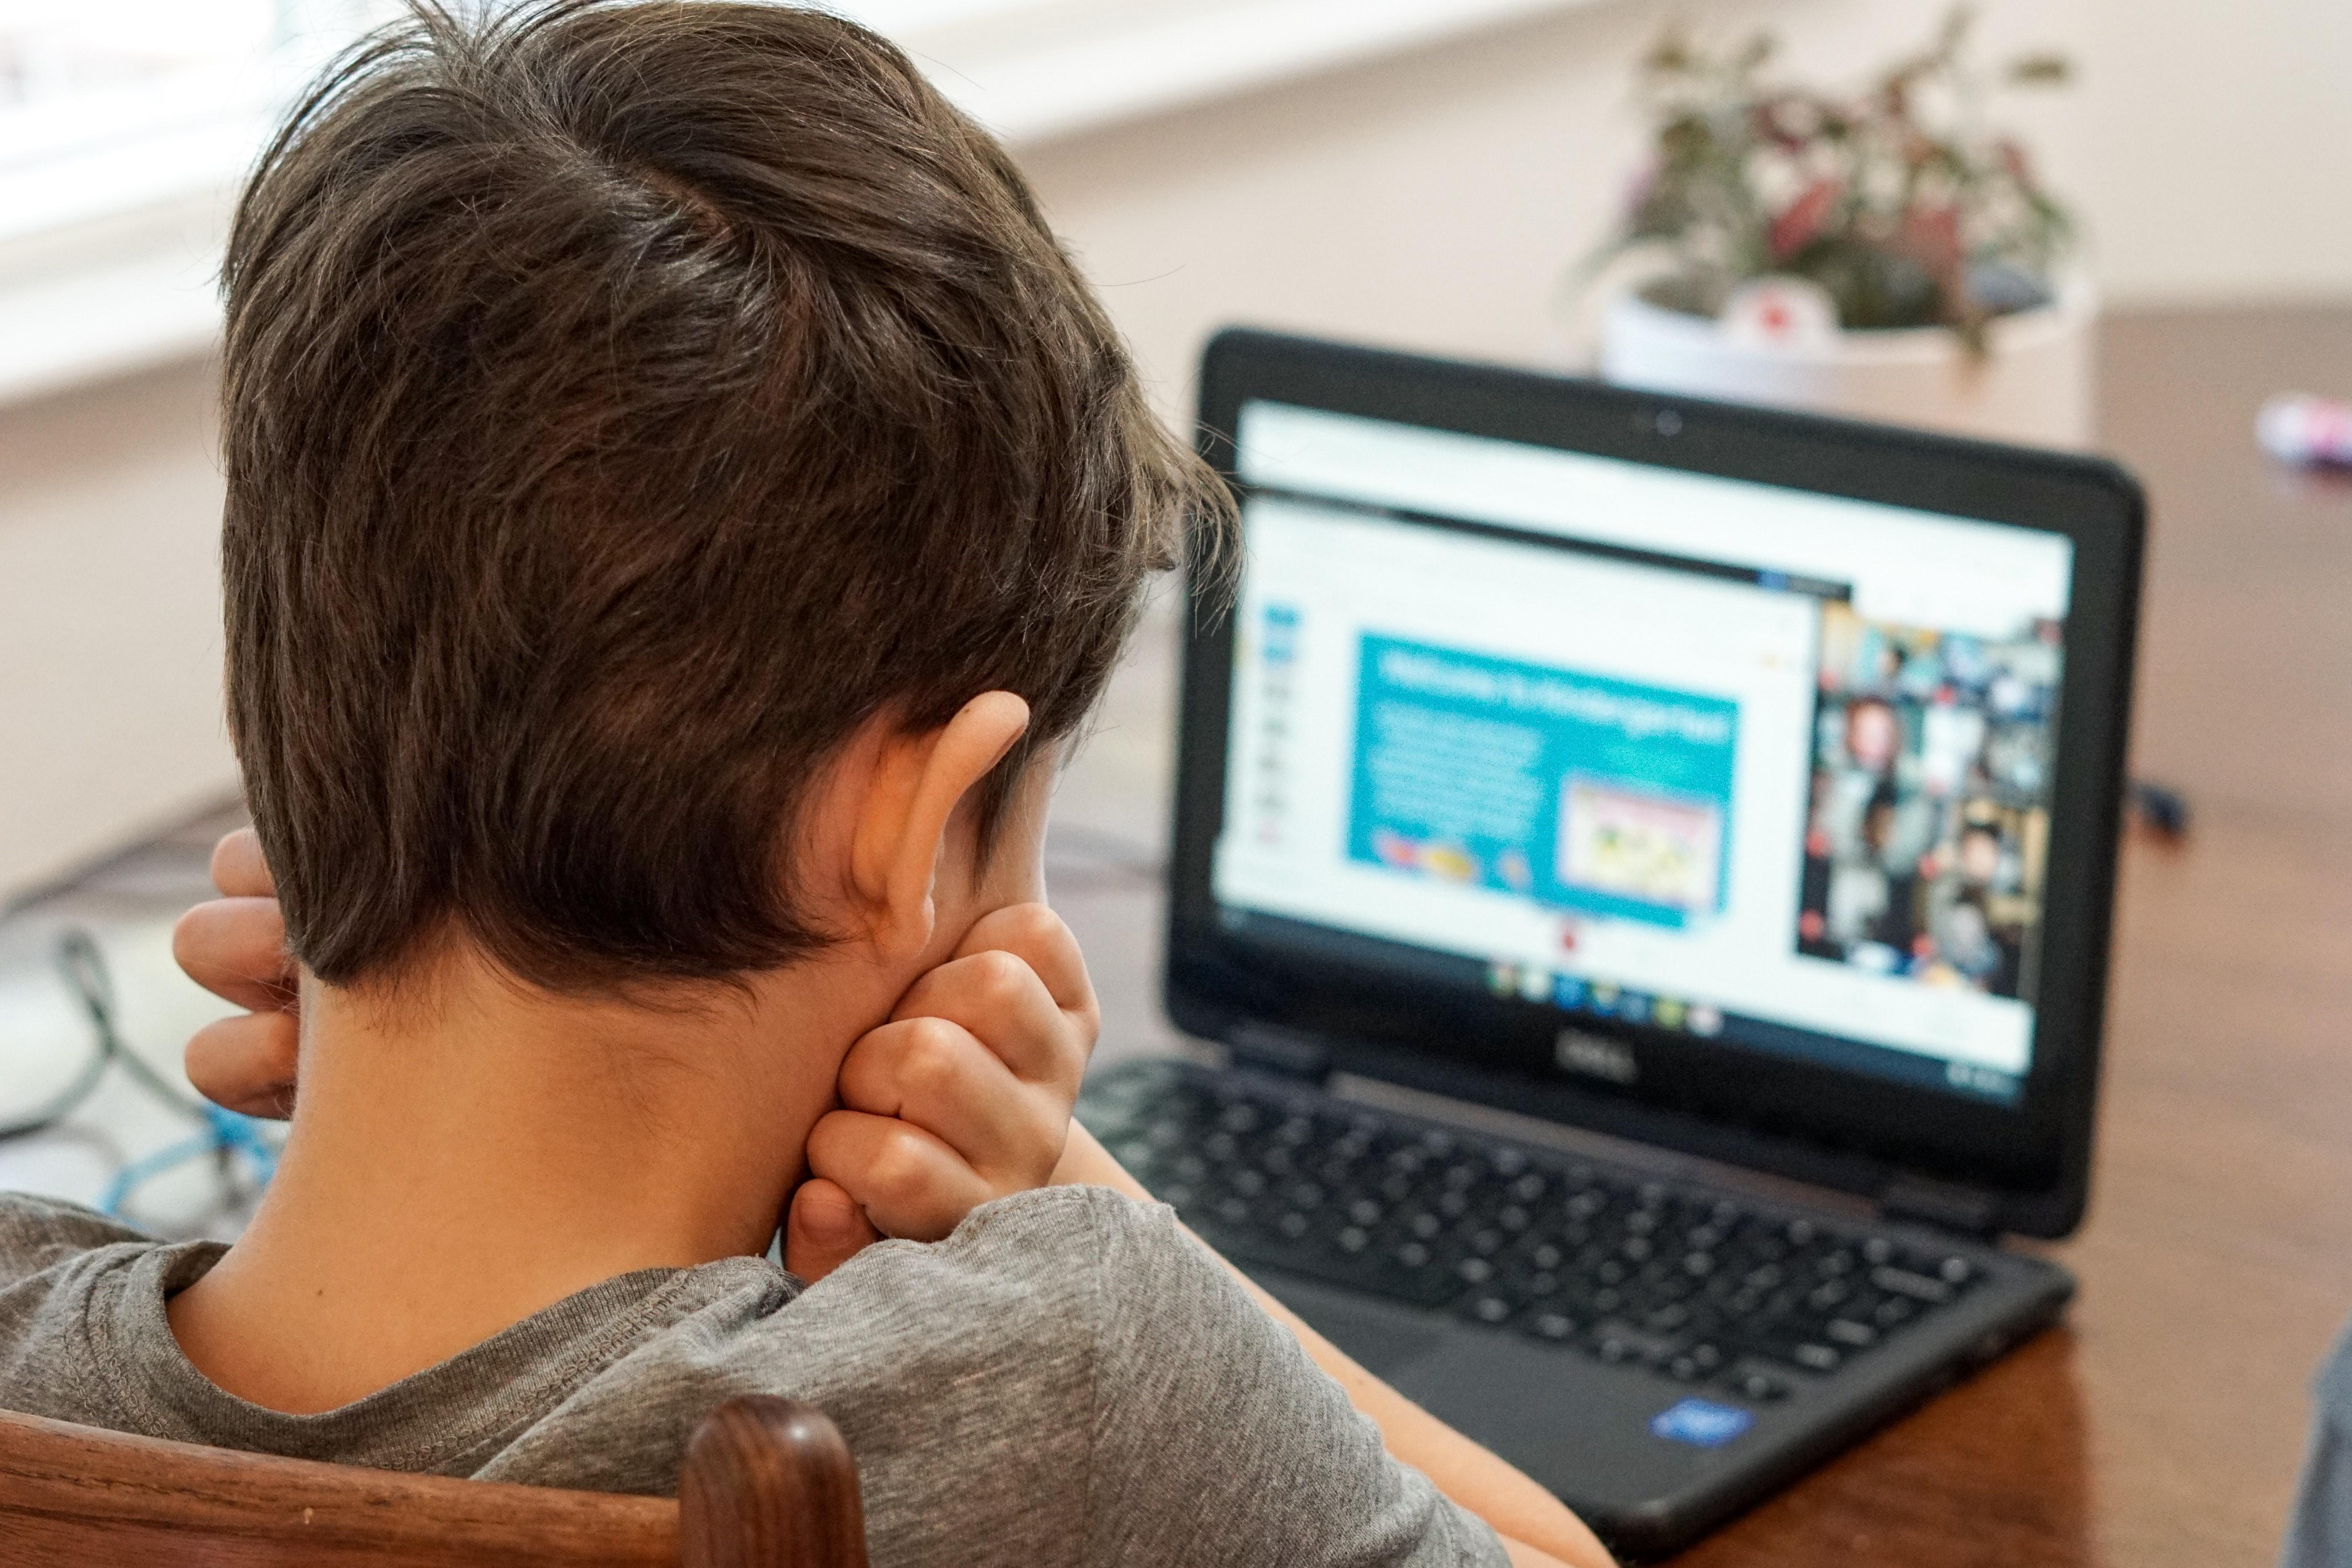 kid in front of laptop - drdp online